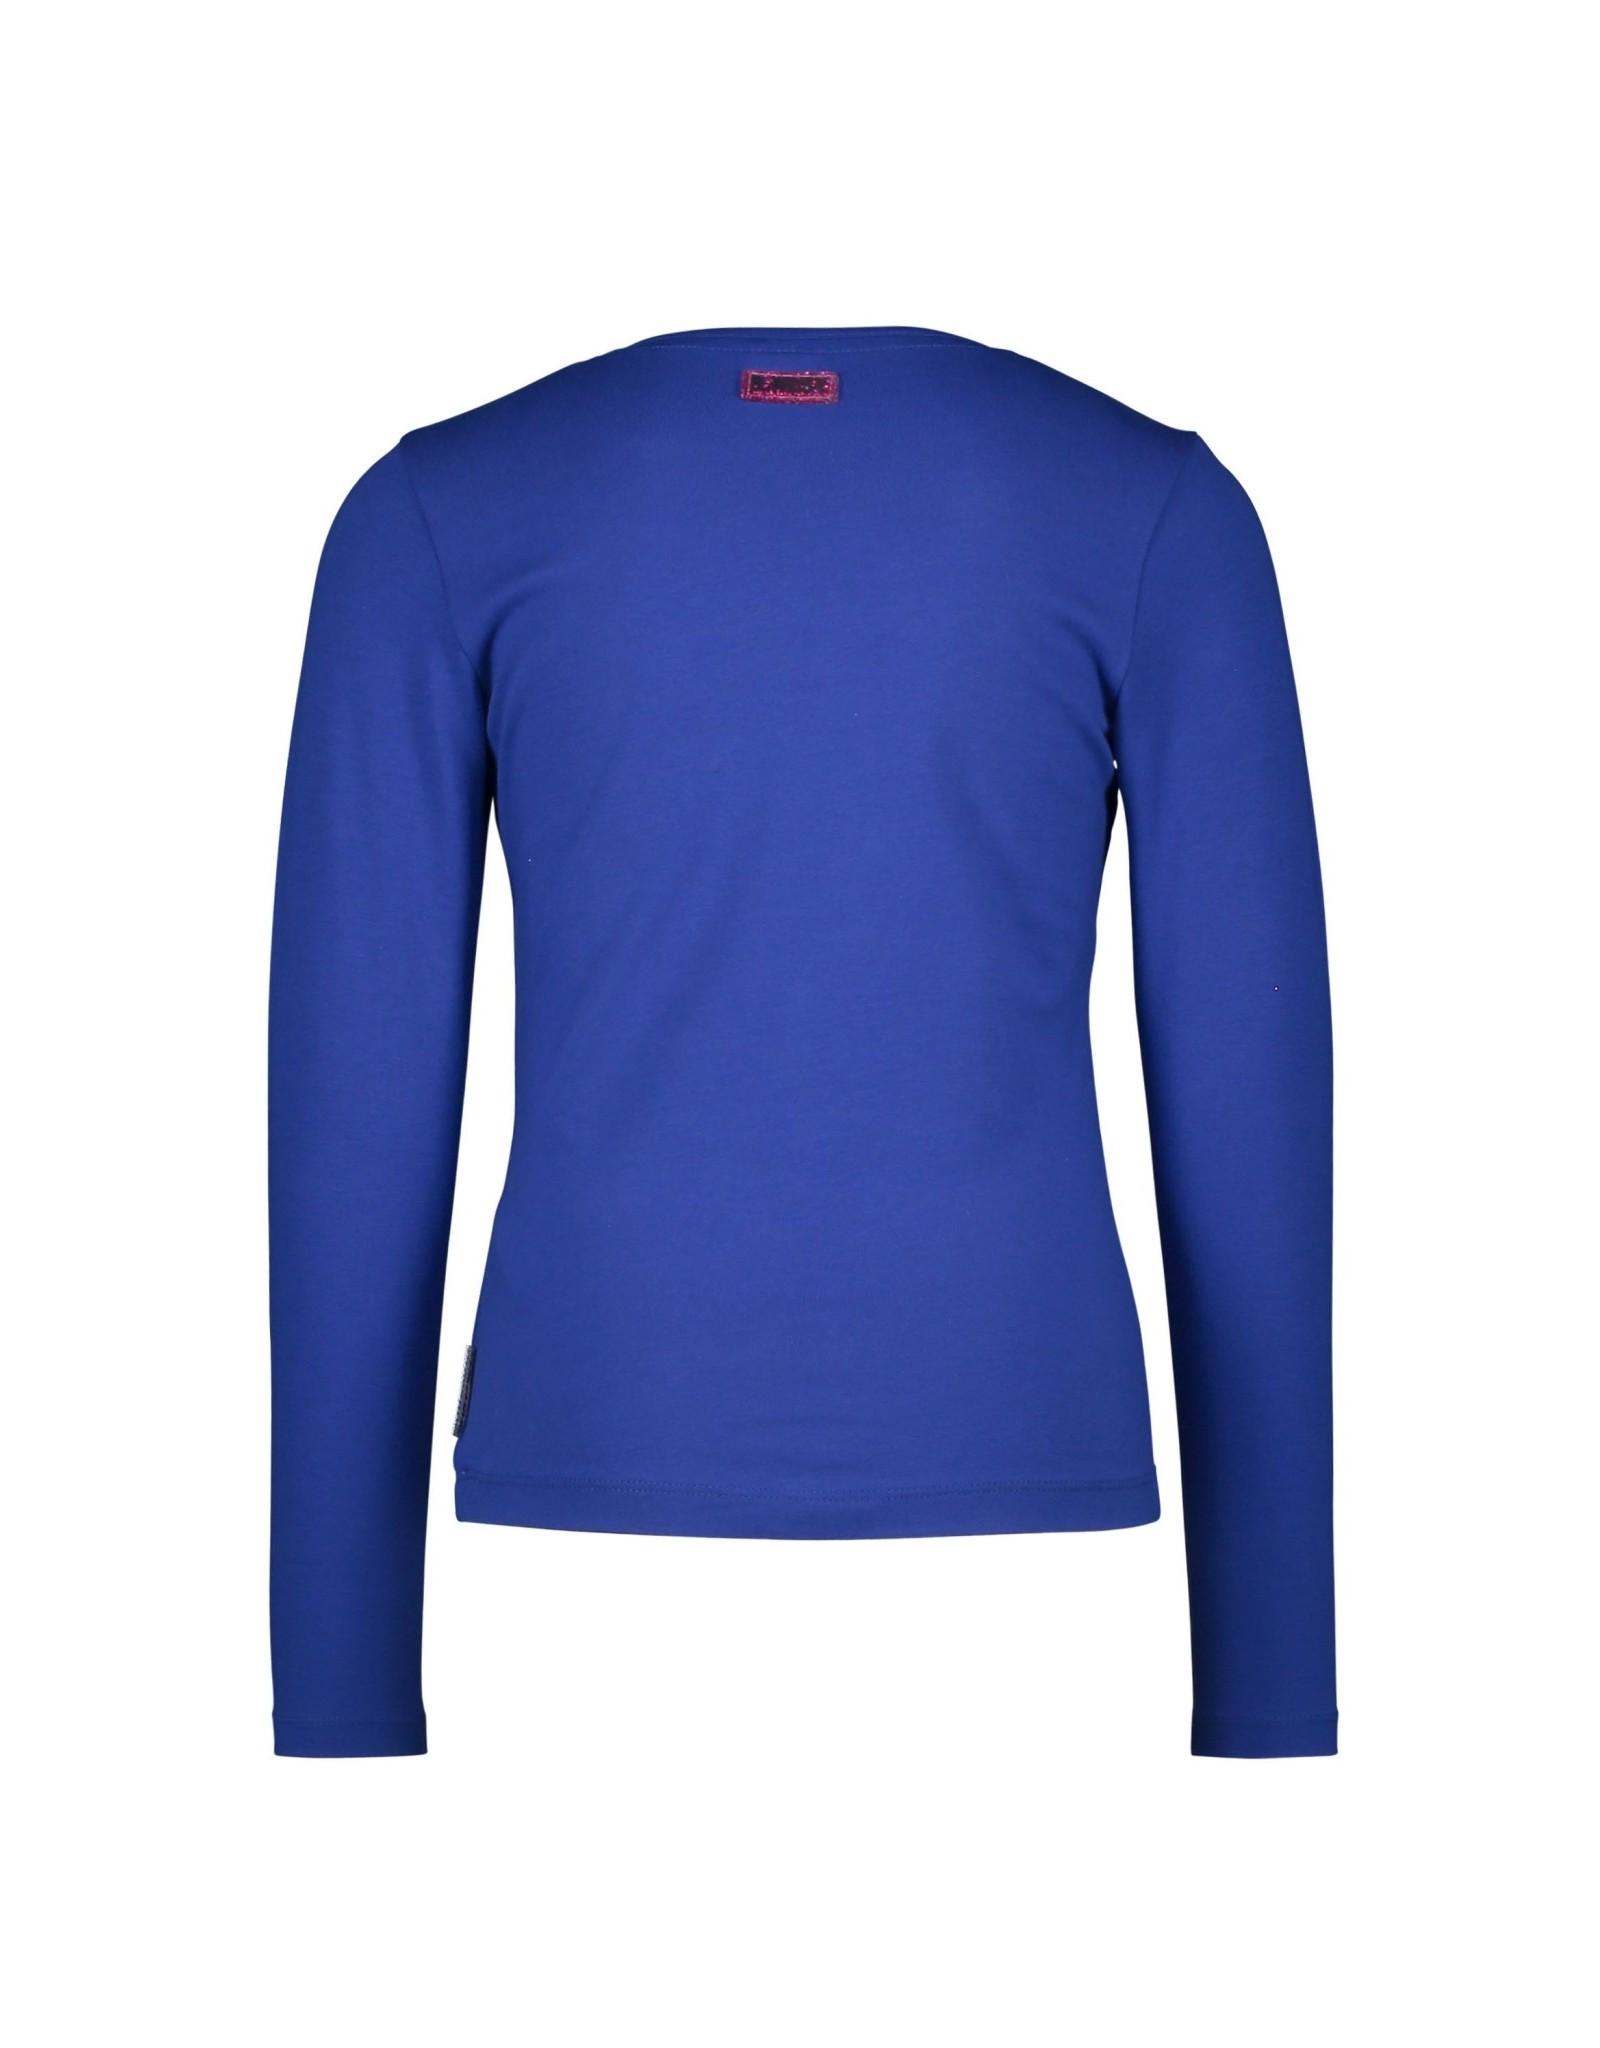 B.Nosy B.Nosy meisjes shirt Dazzle Cobalt Blue